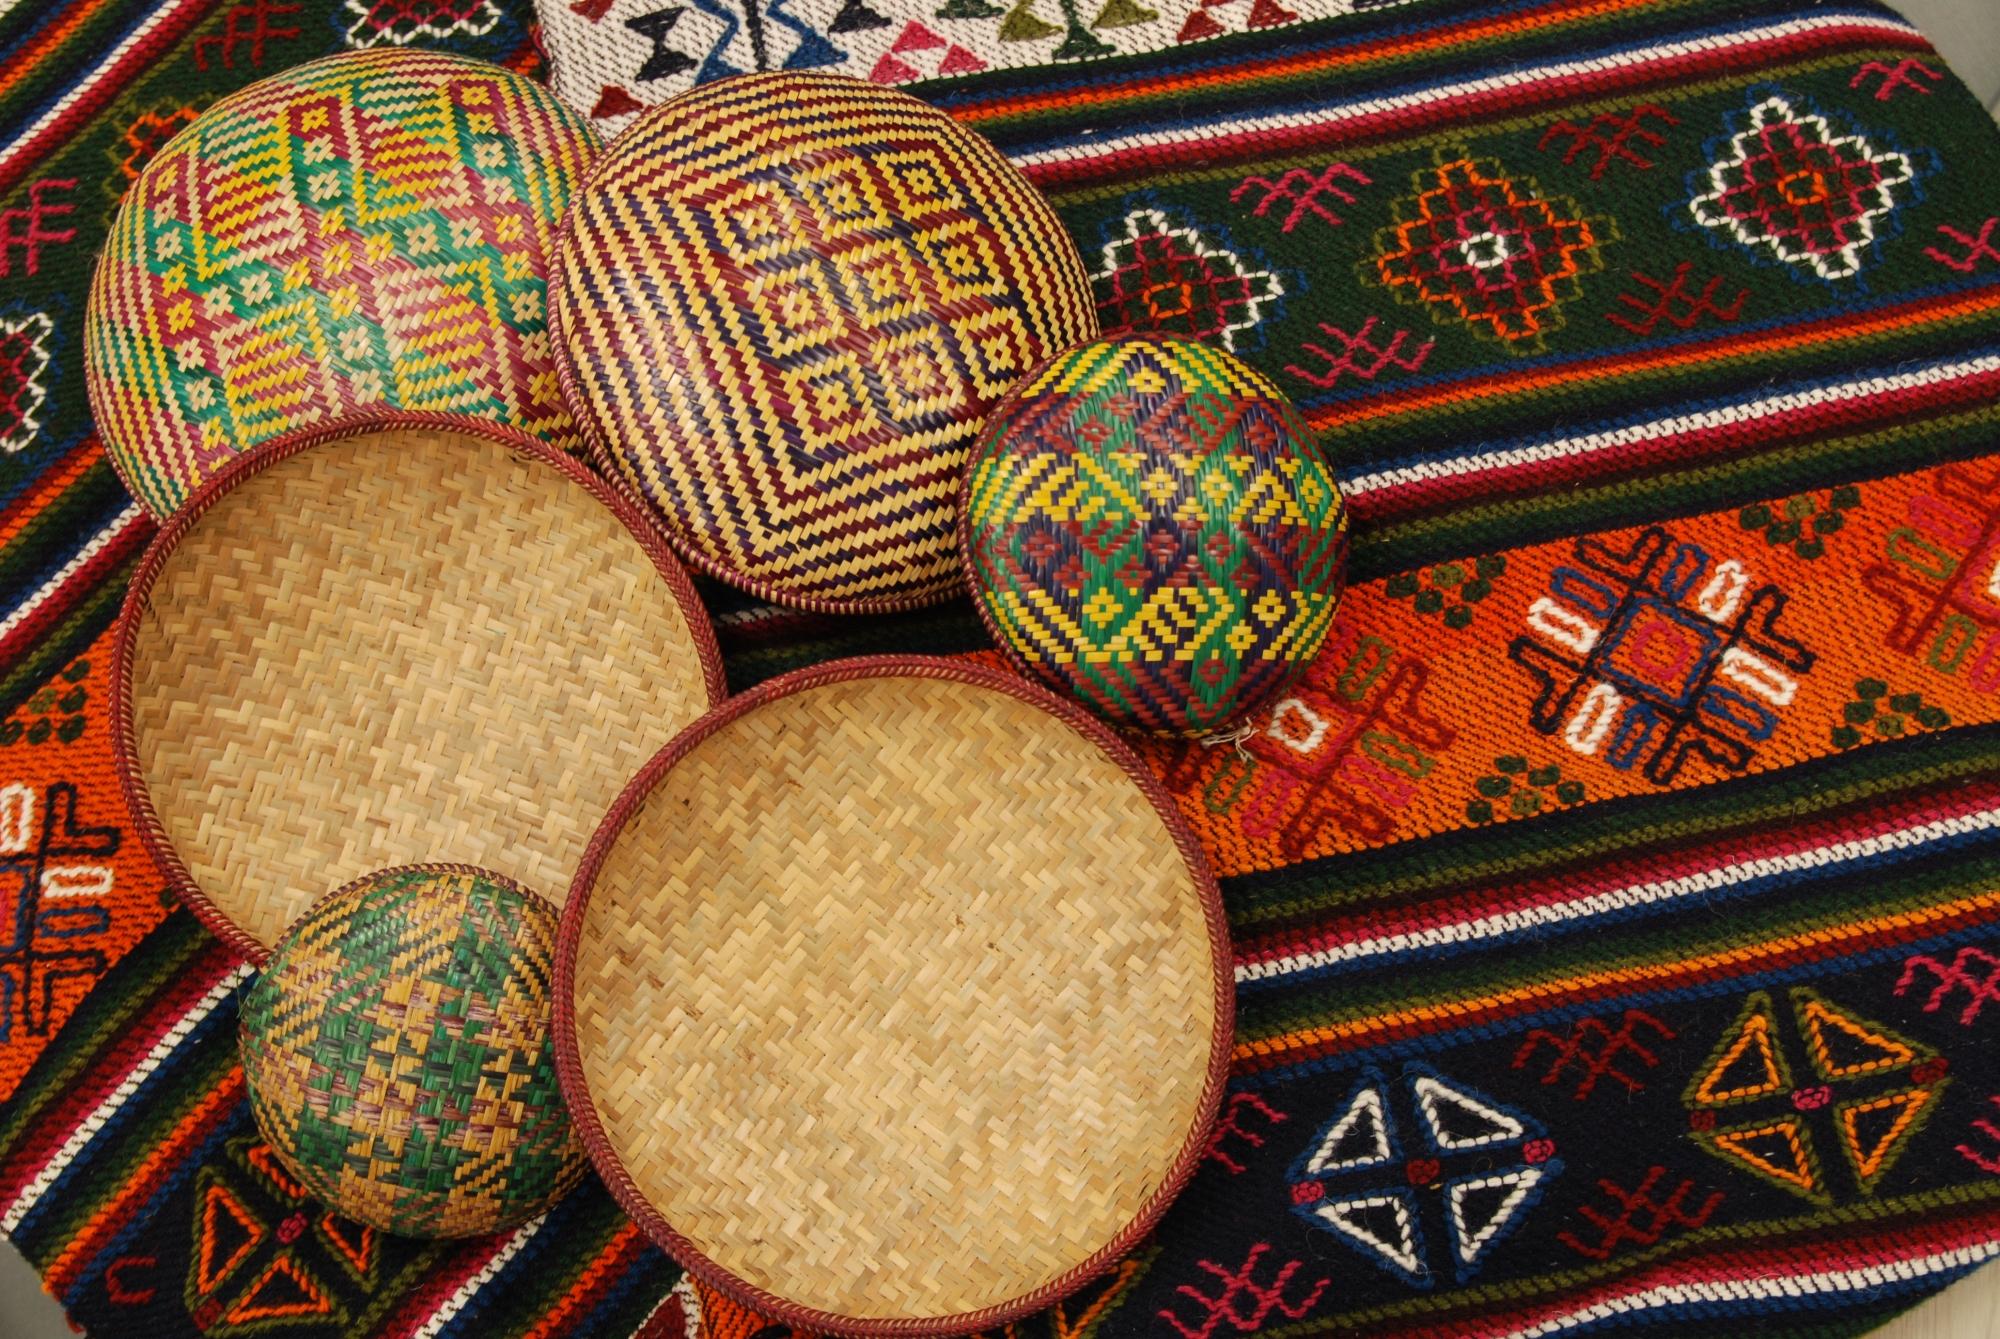 The art of bamboo weaving